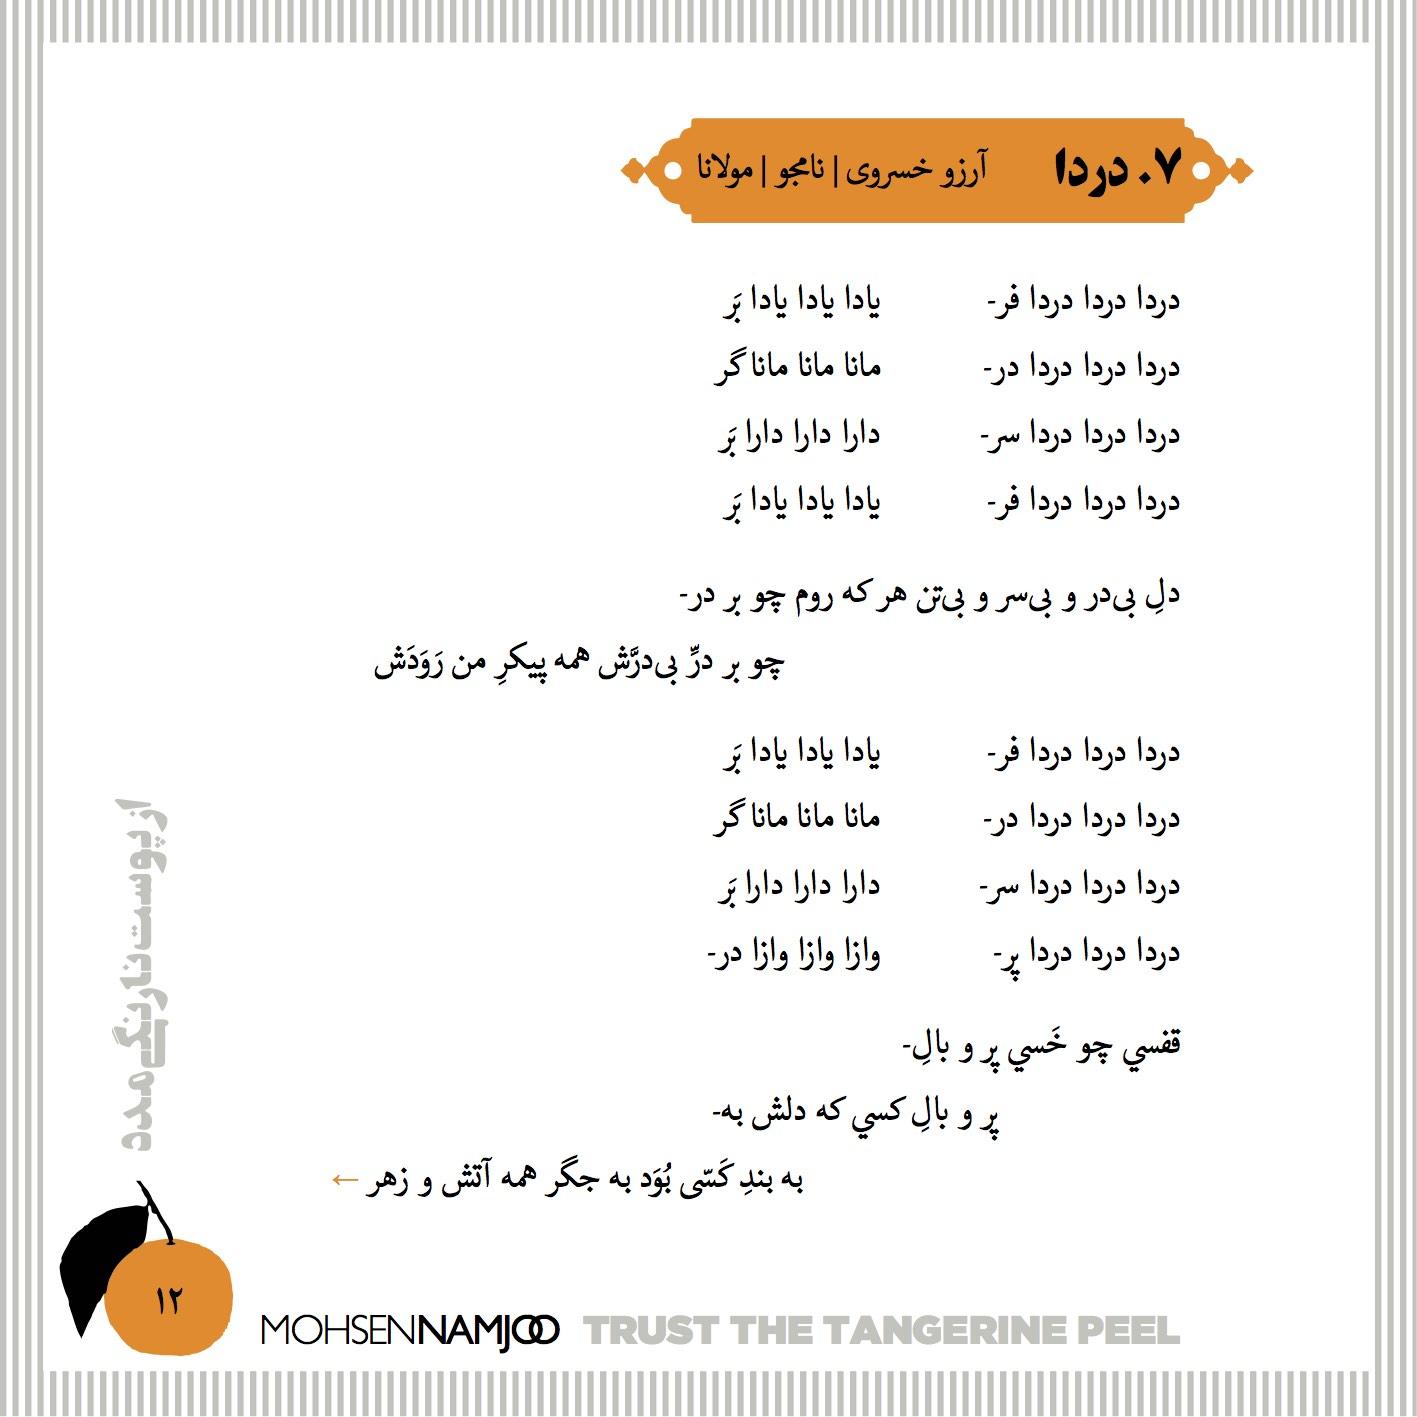 13-Trust the Tangerine Peel Final.jpg